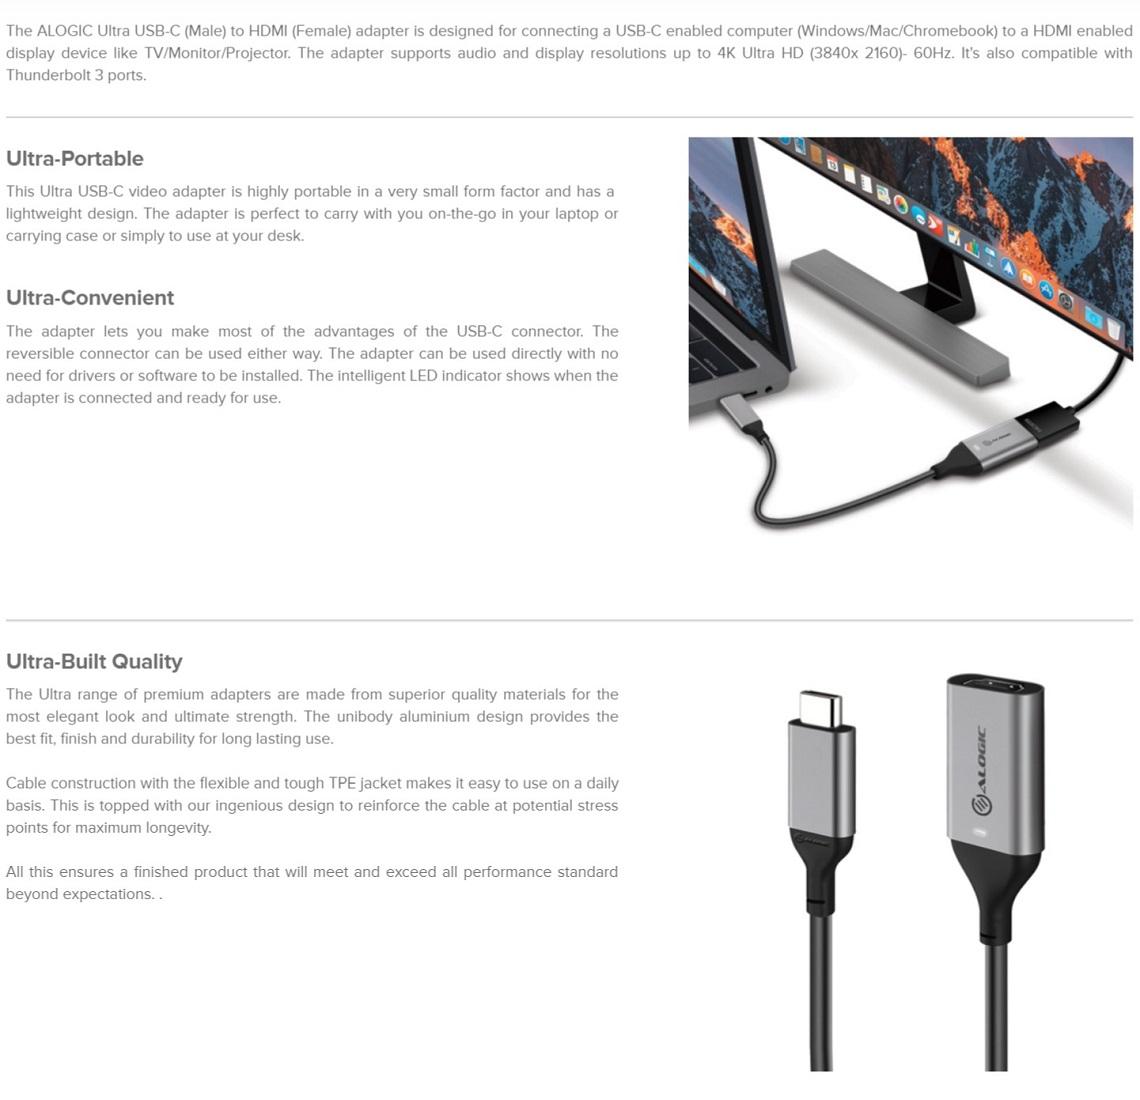 Alogic 15cm Ultra USB-C (Male) to HDMI (Female) Adapter 4K @60Hz Ultra-Portable